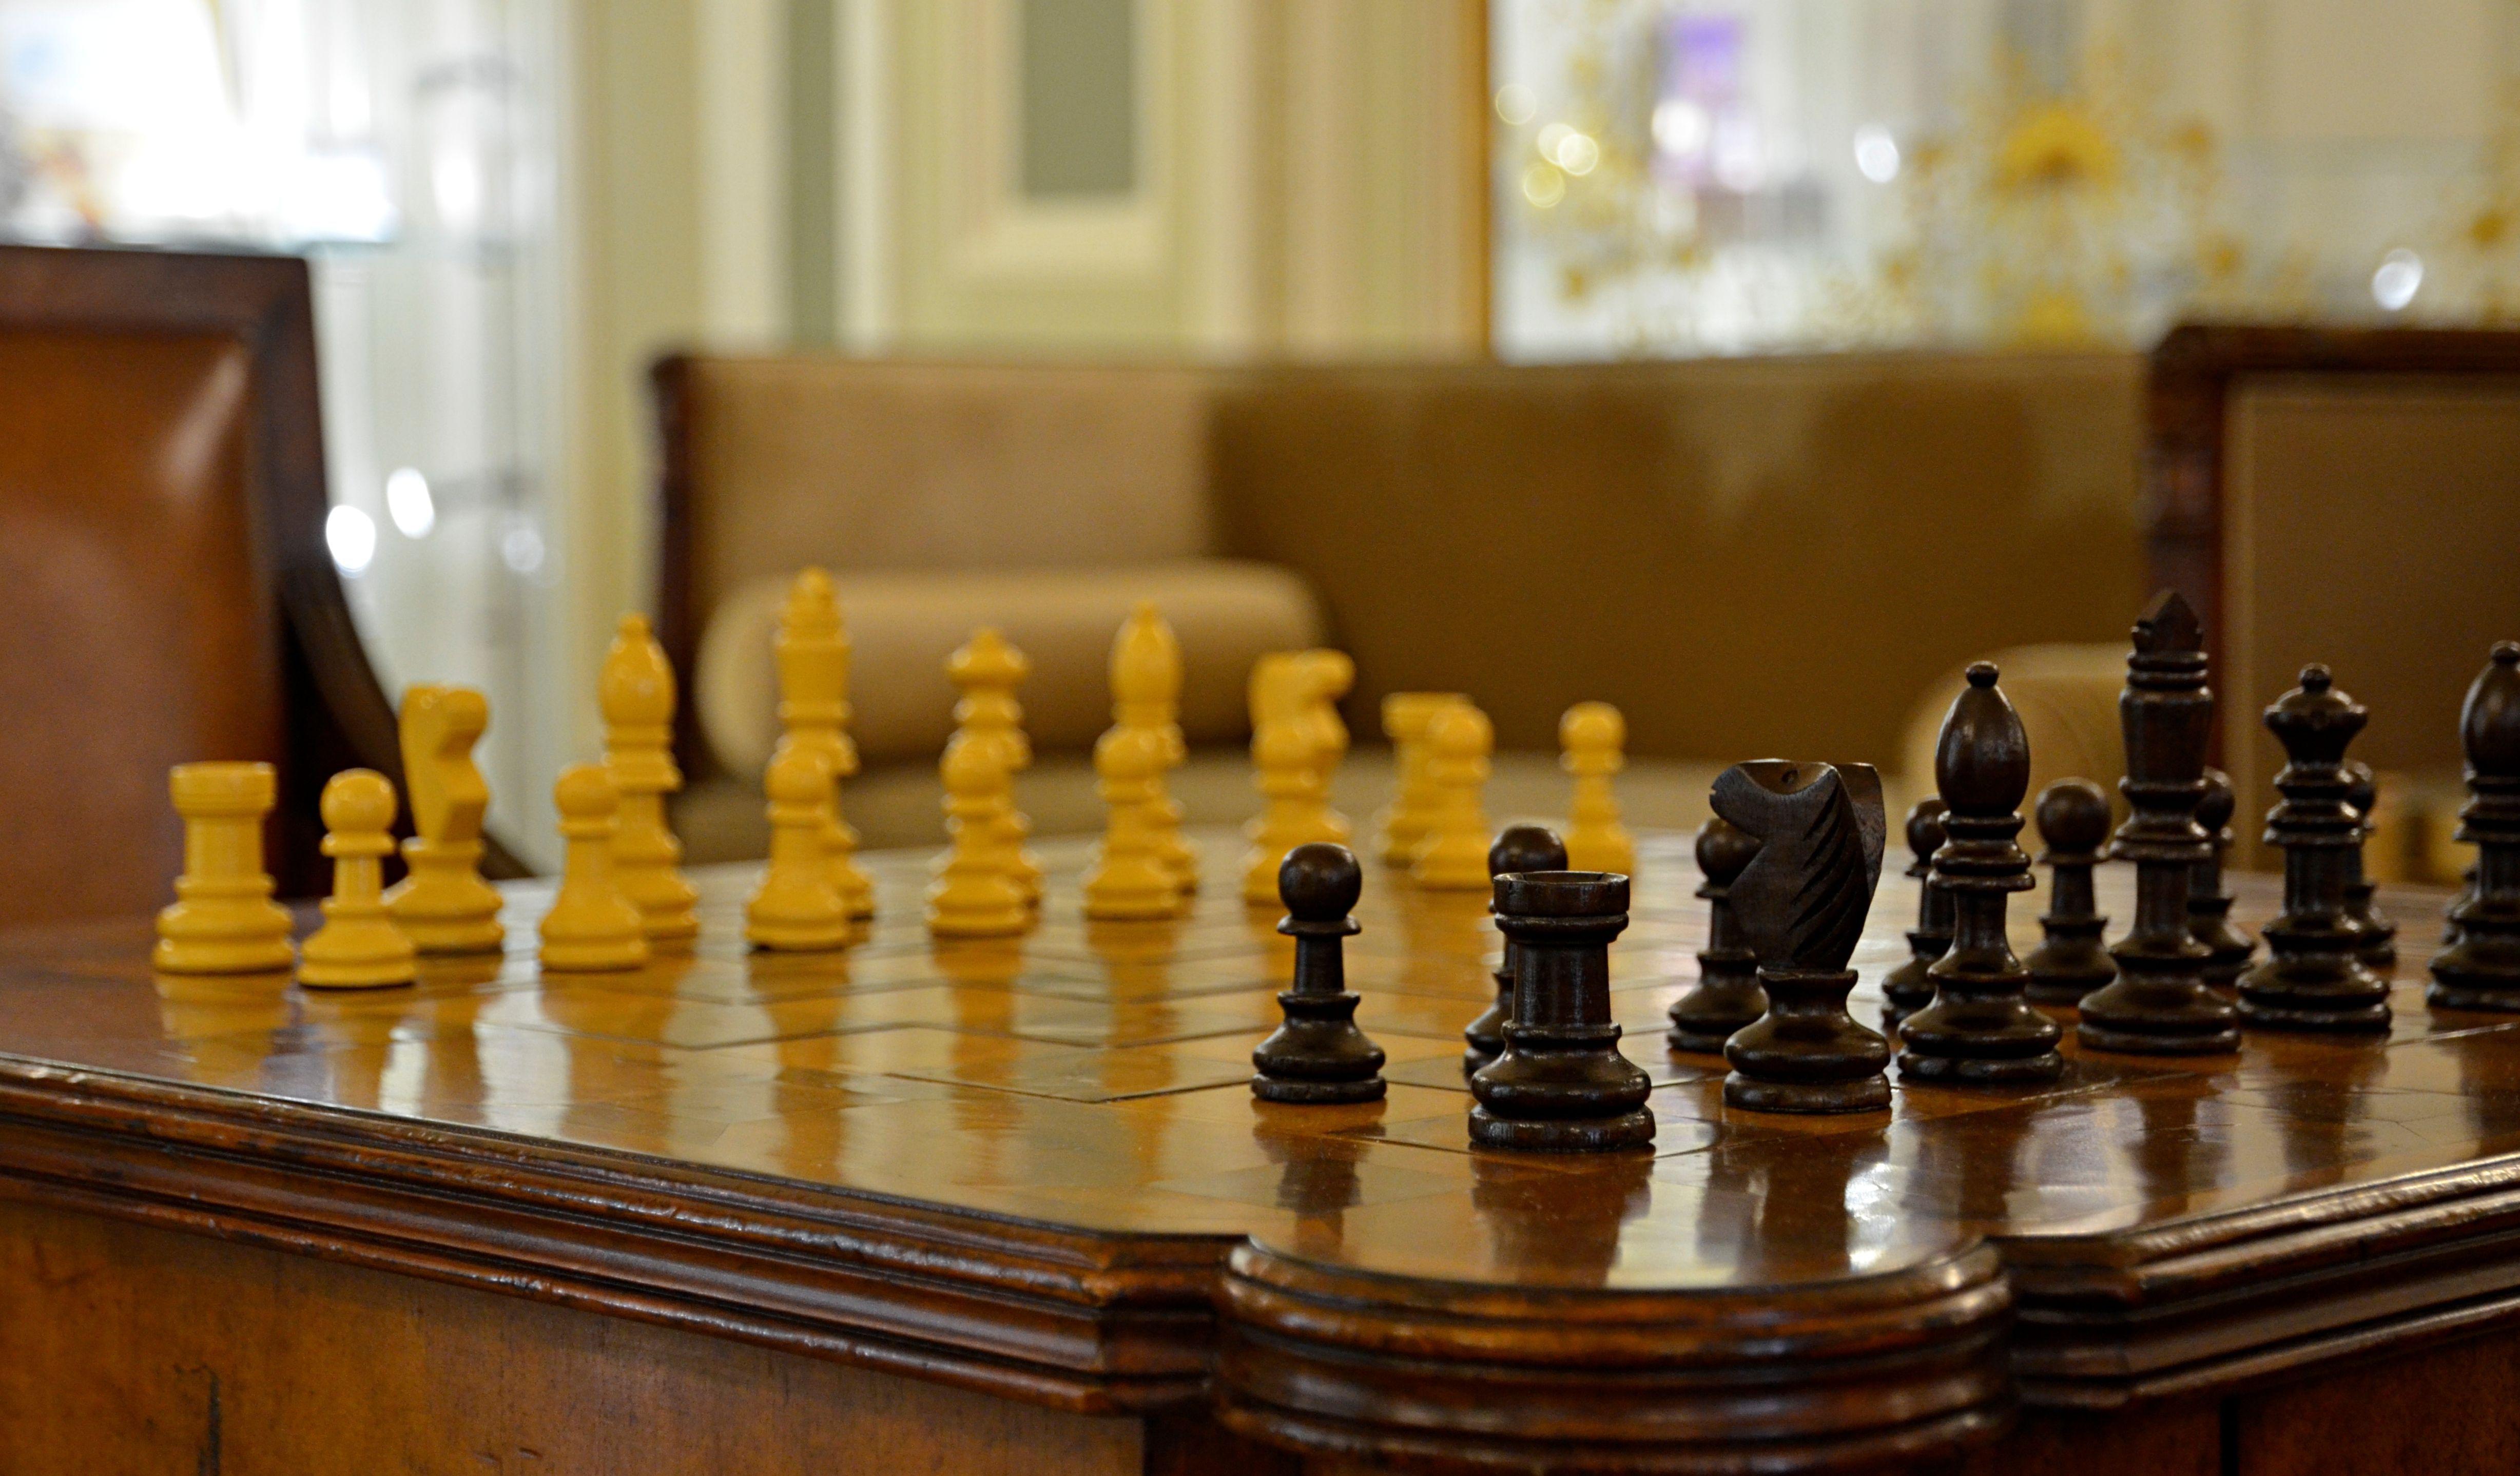 Турнир по шахматам ко Дню защитника Отечества проведут в Кокошкине